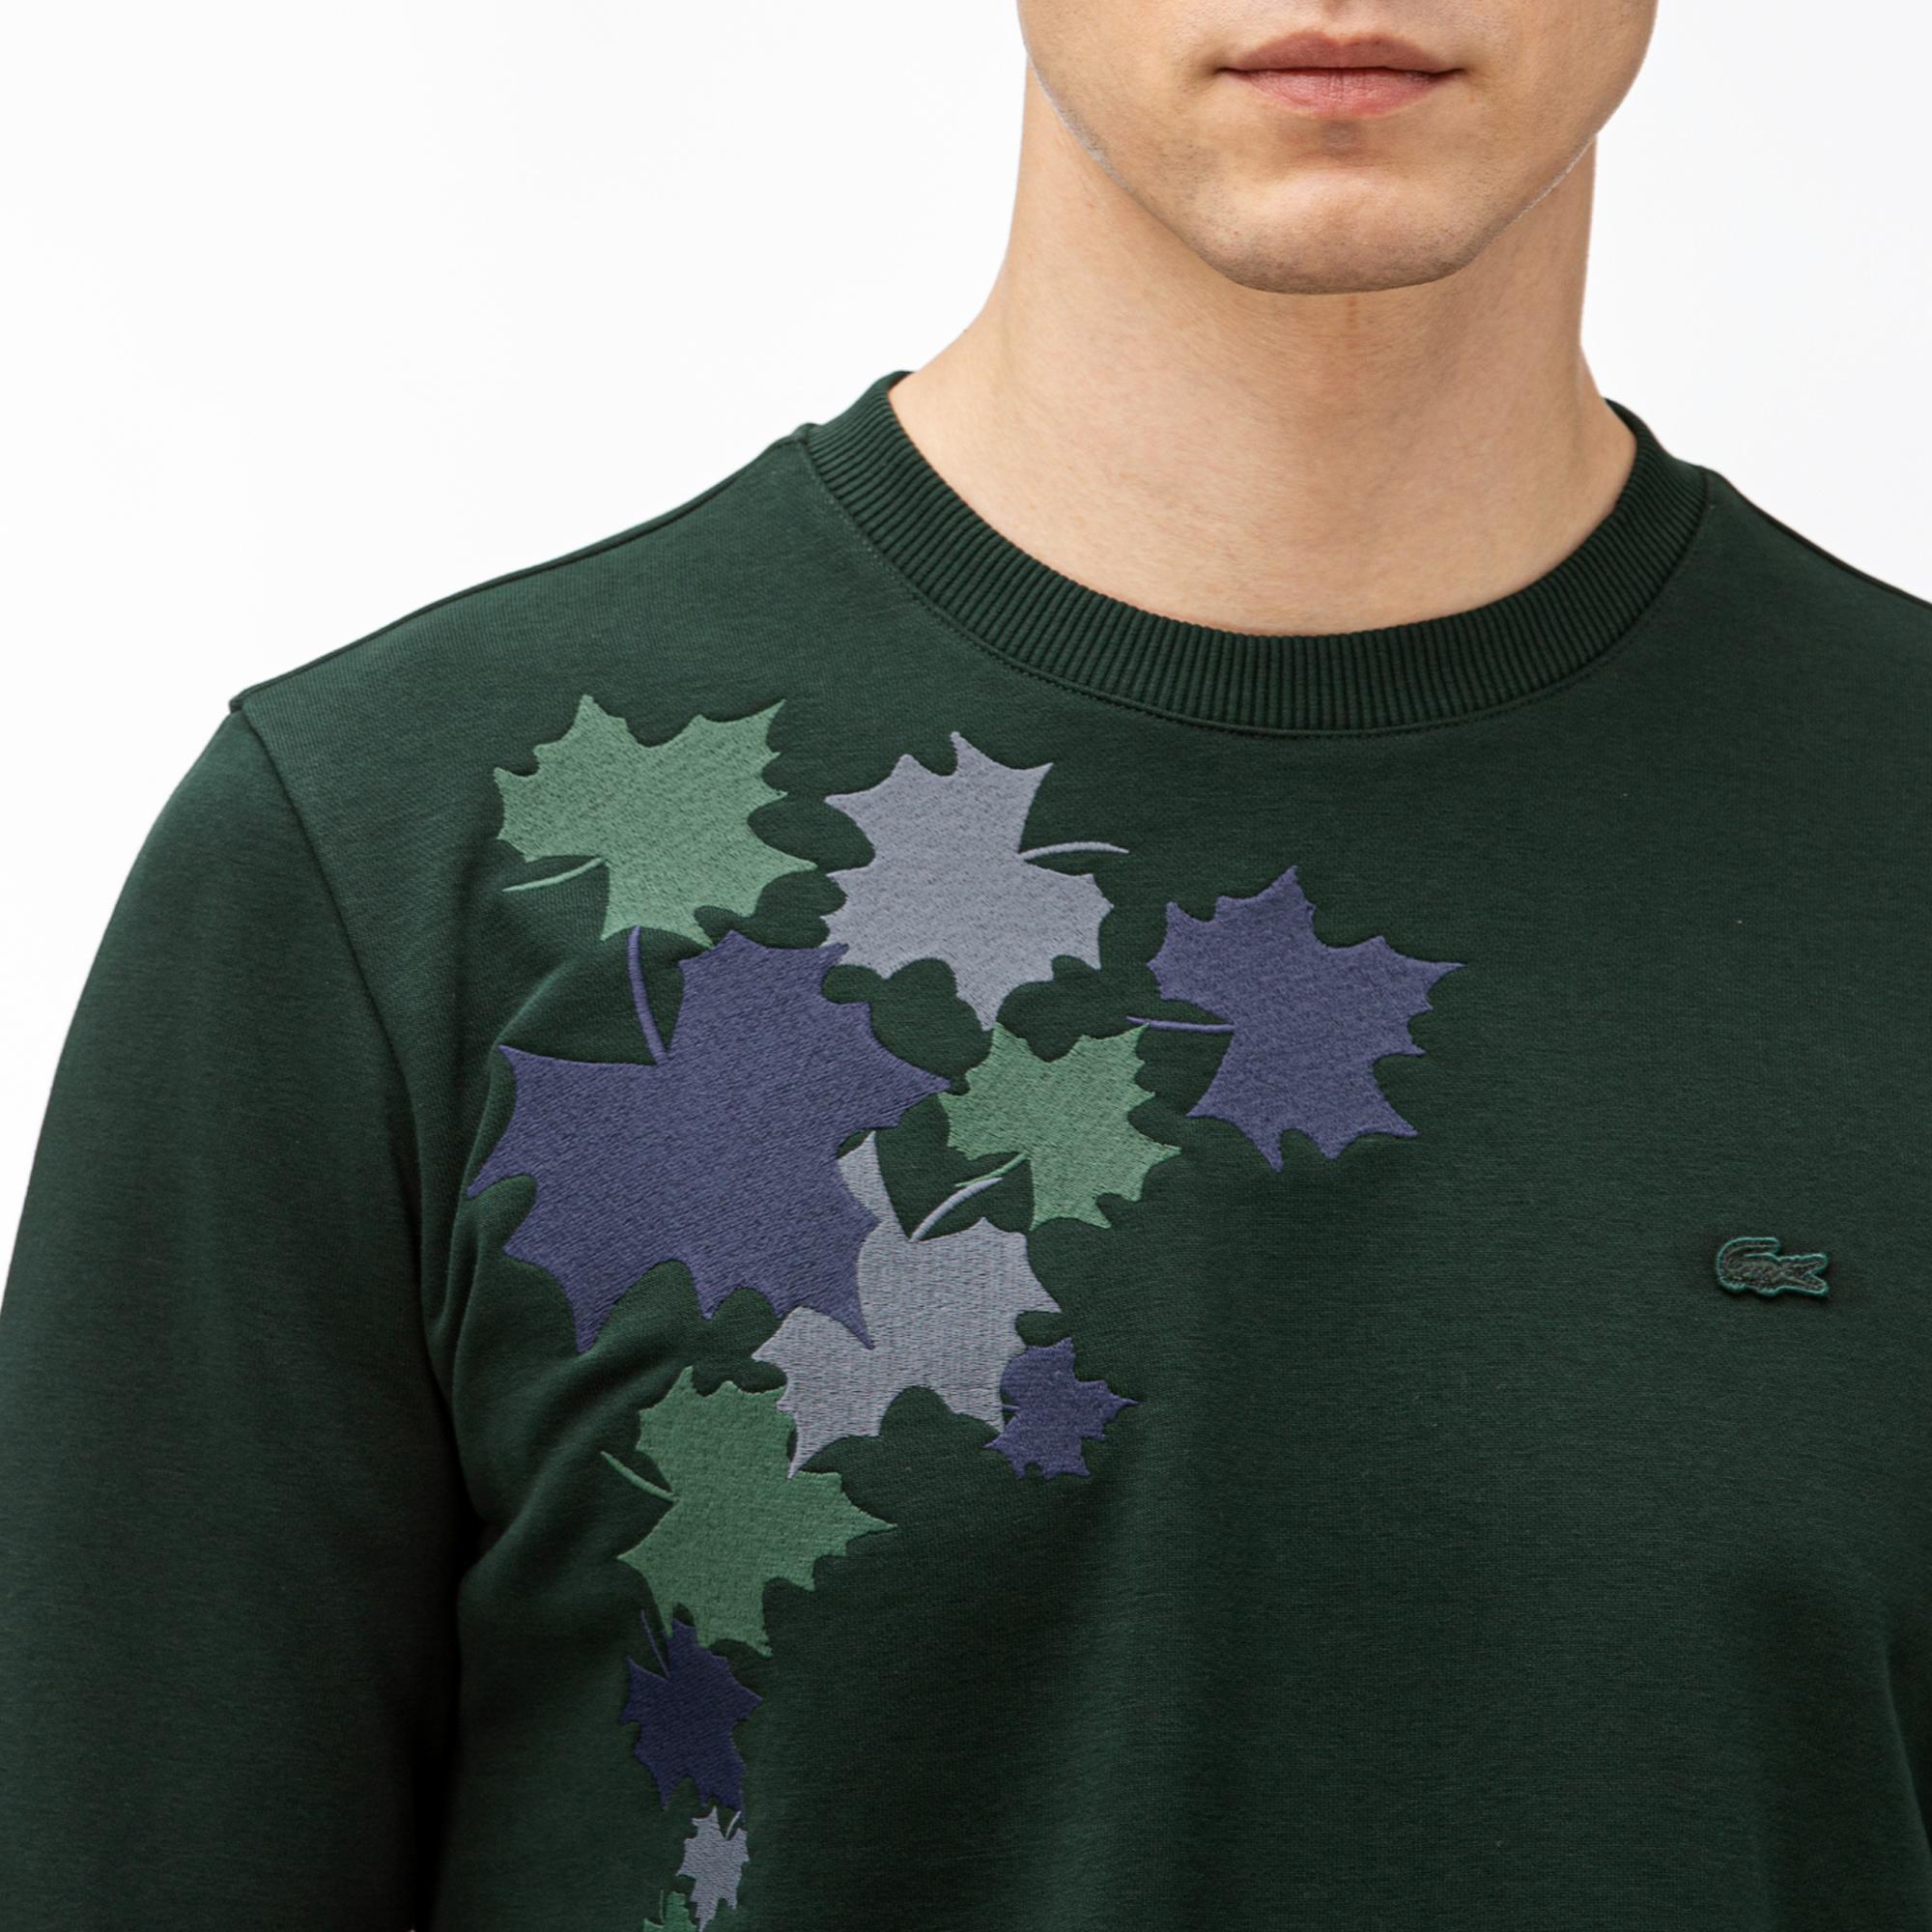 Lacoste Erkek Desenli Yeşil Sweatshirt